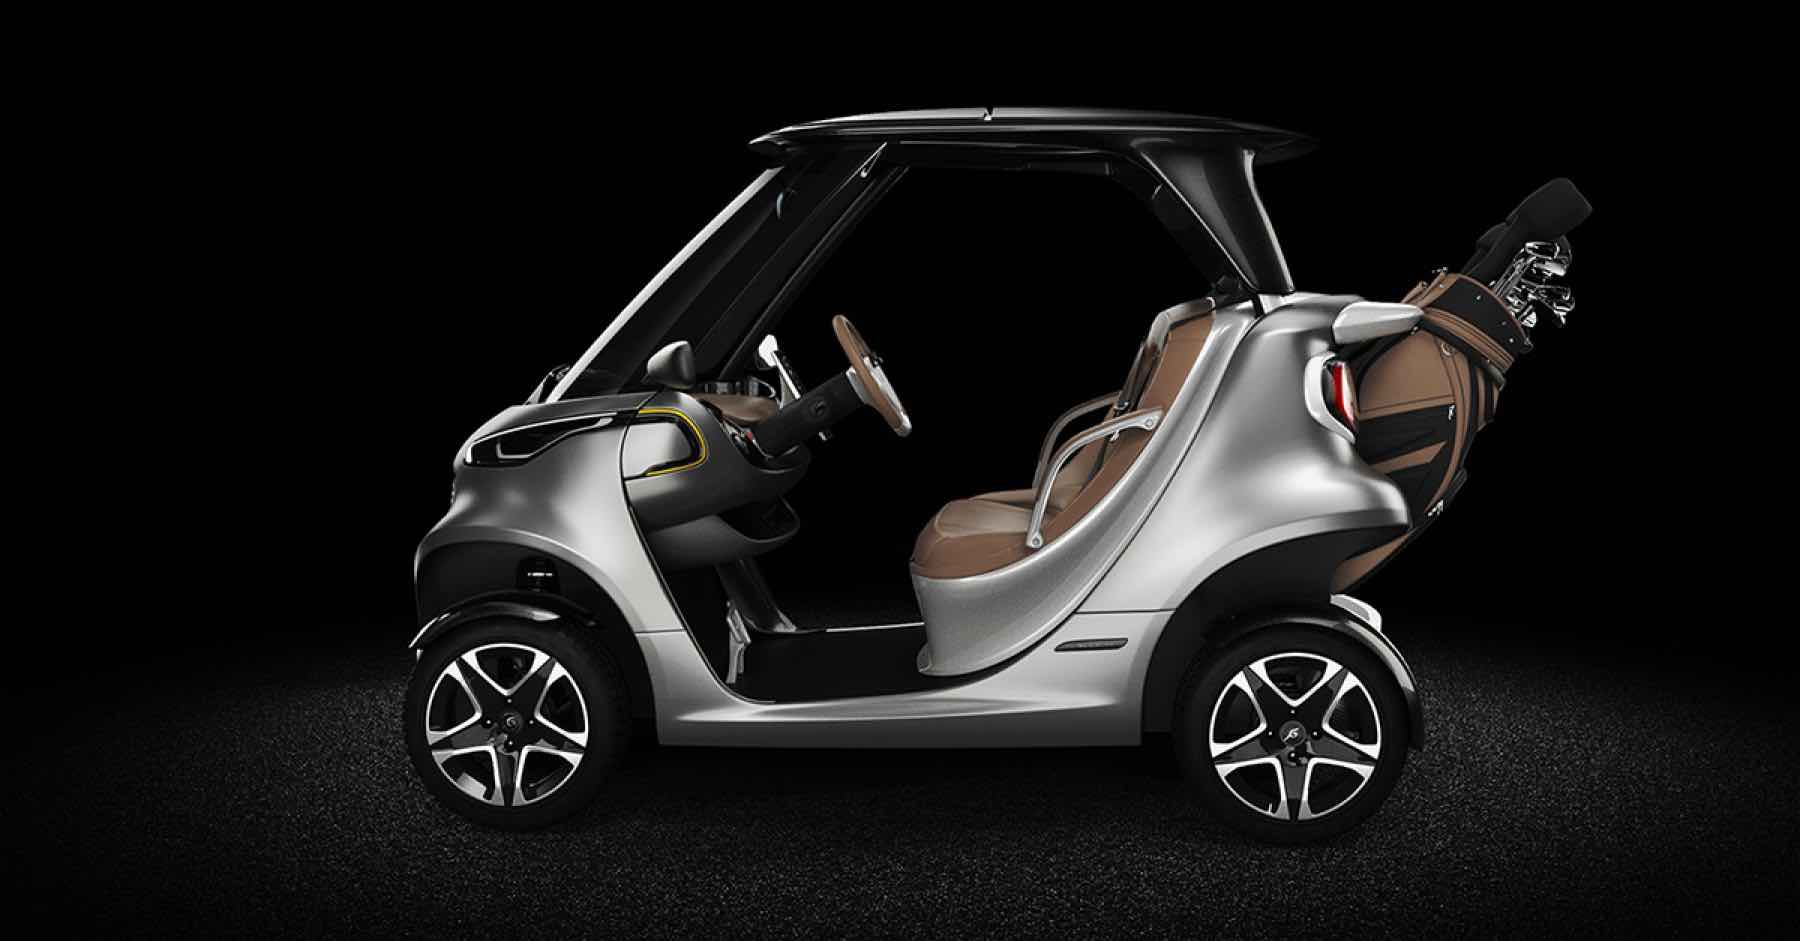 Garia Golf Car inspirado en el Mercedes-Benz Style